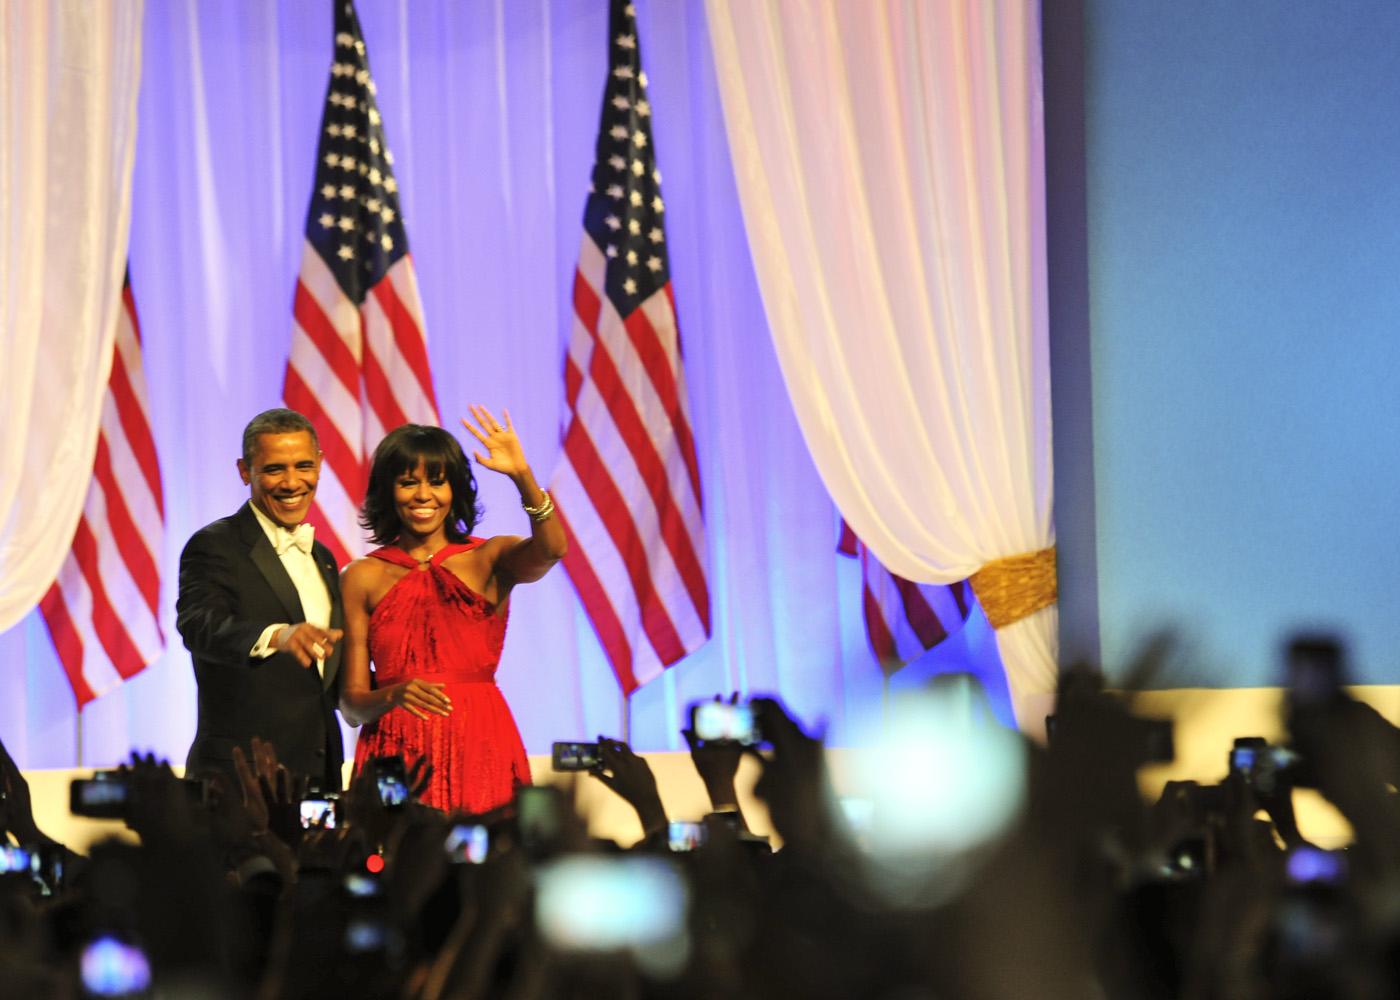 Michele Obama at Inauguration Ball 2012